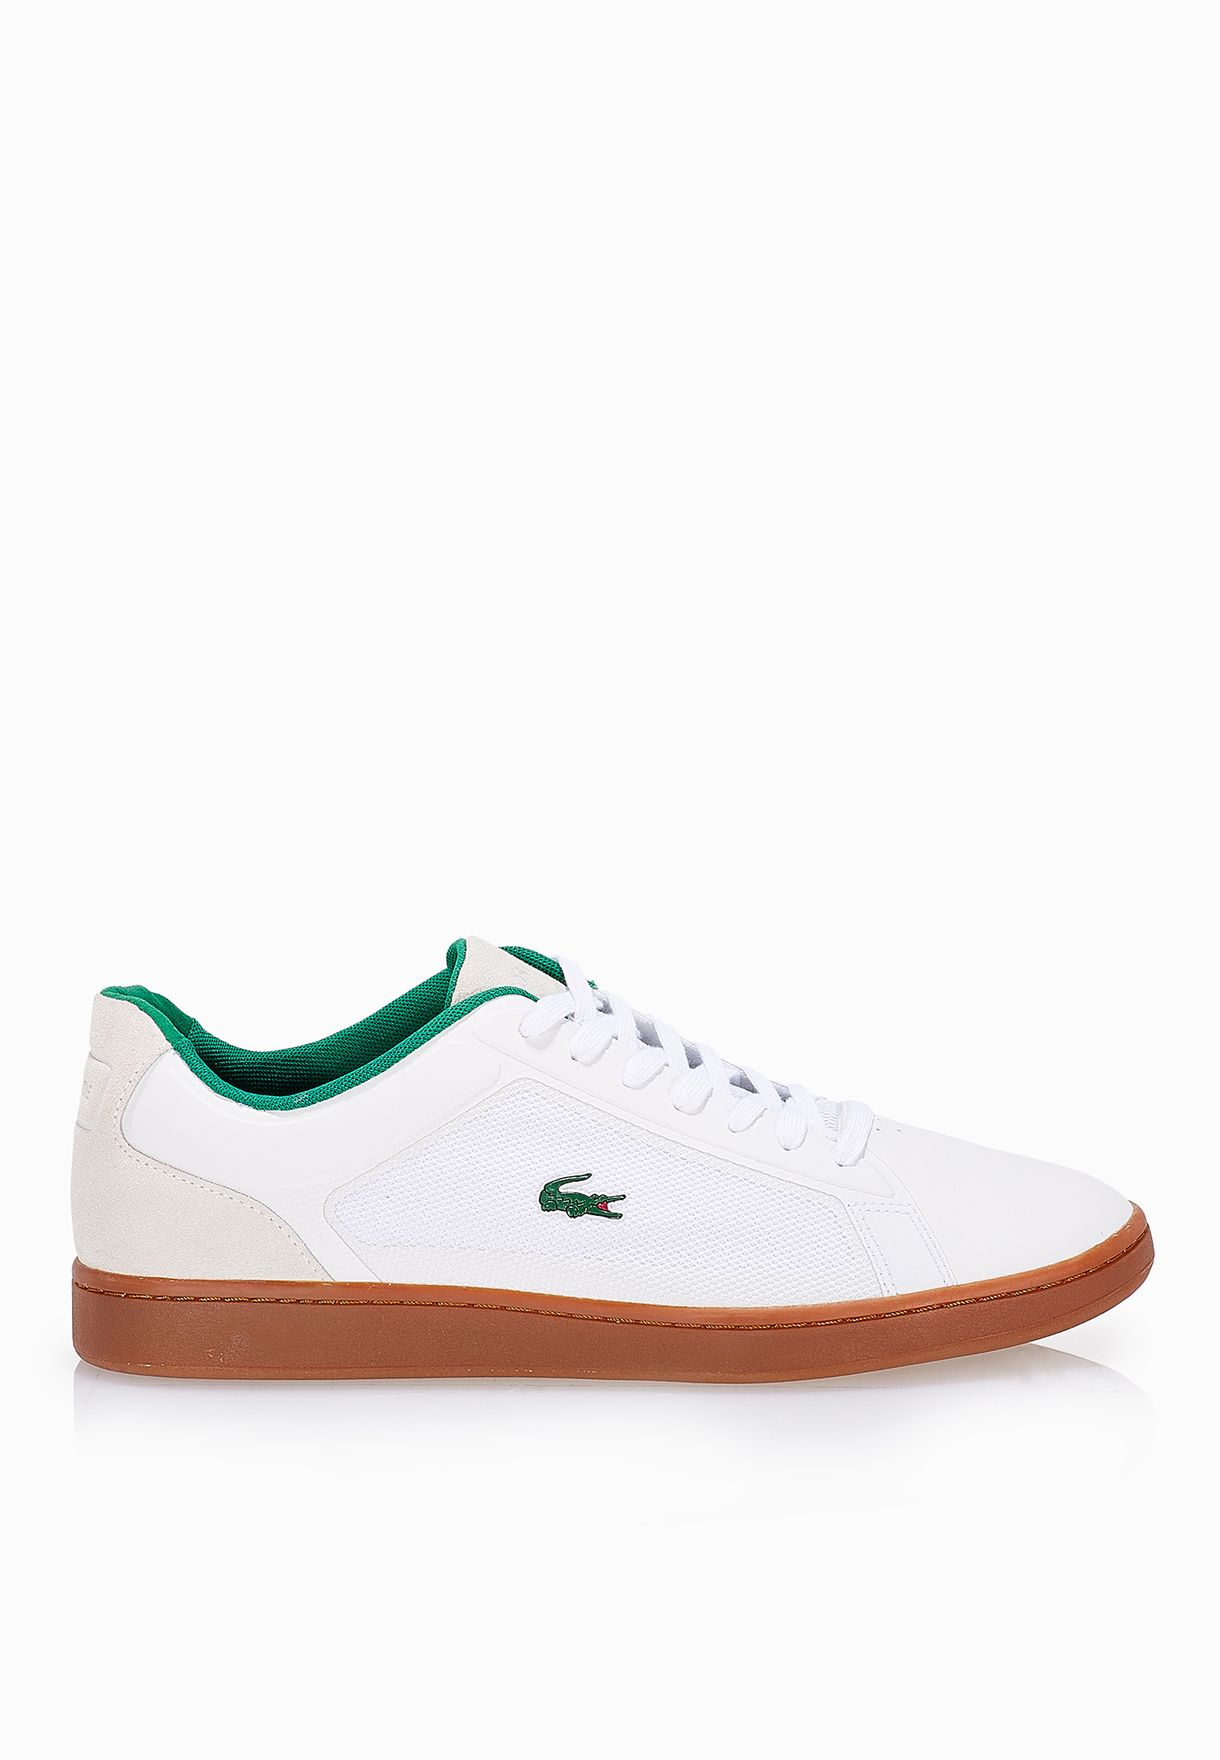 54737ef77 Shop Lacoste white Endliner 116 3 Sneakers 31SPM0041-001 for Men in ...